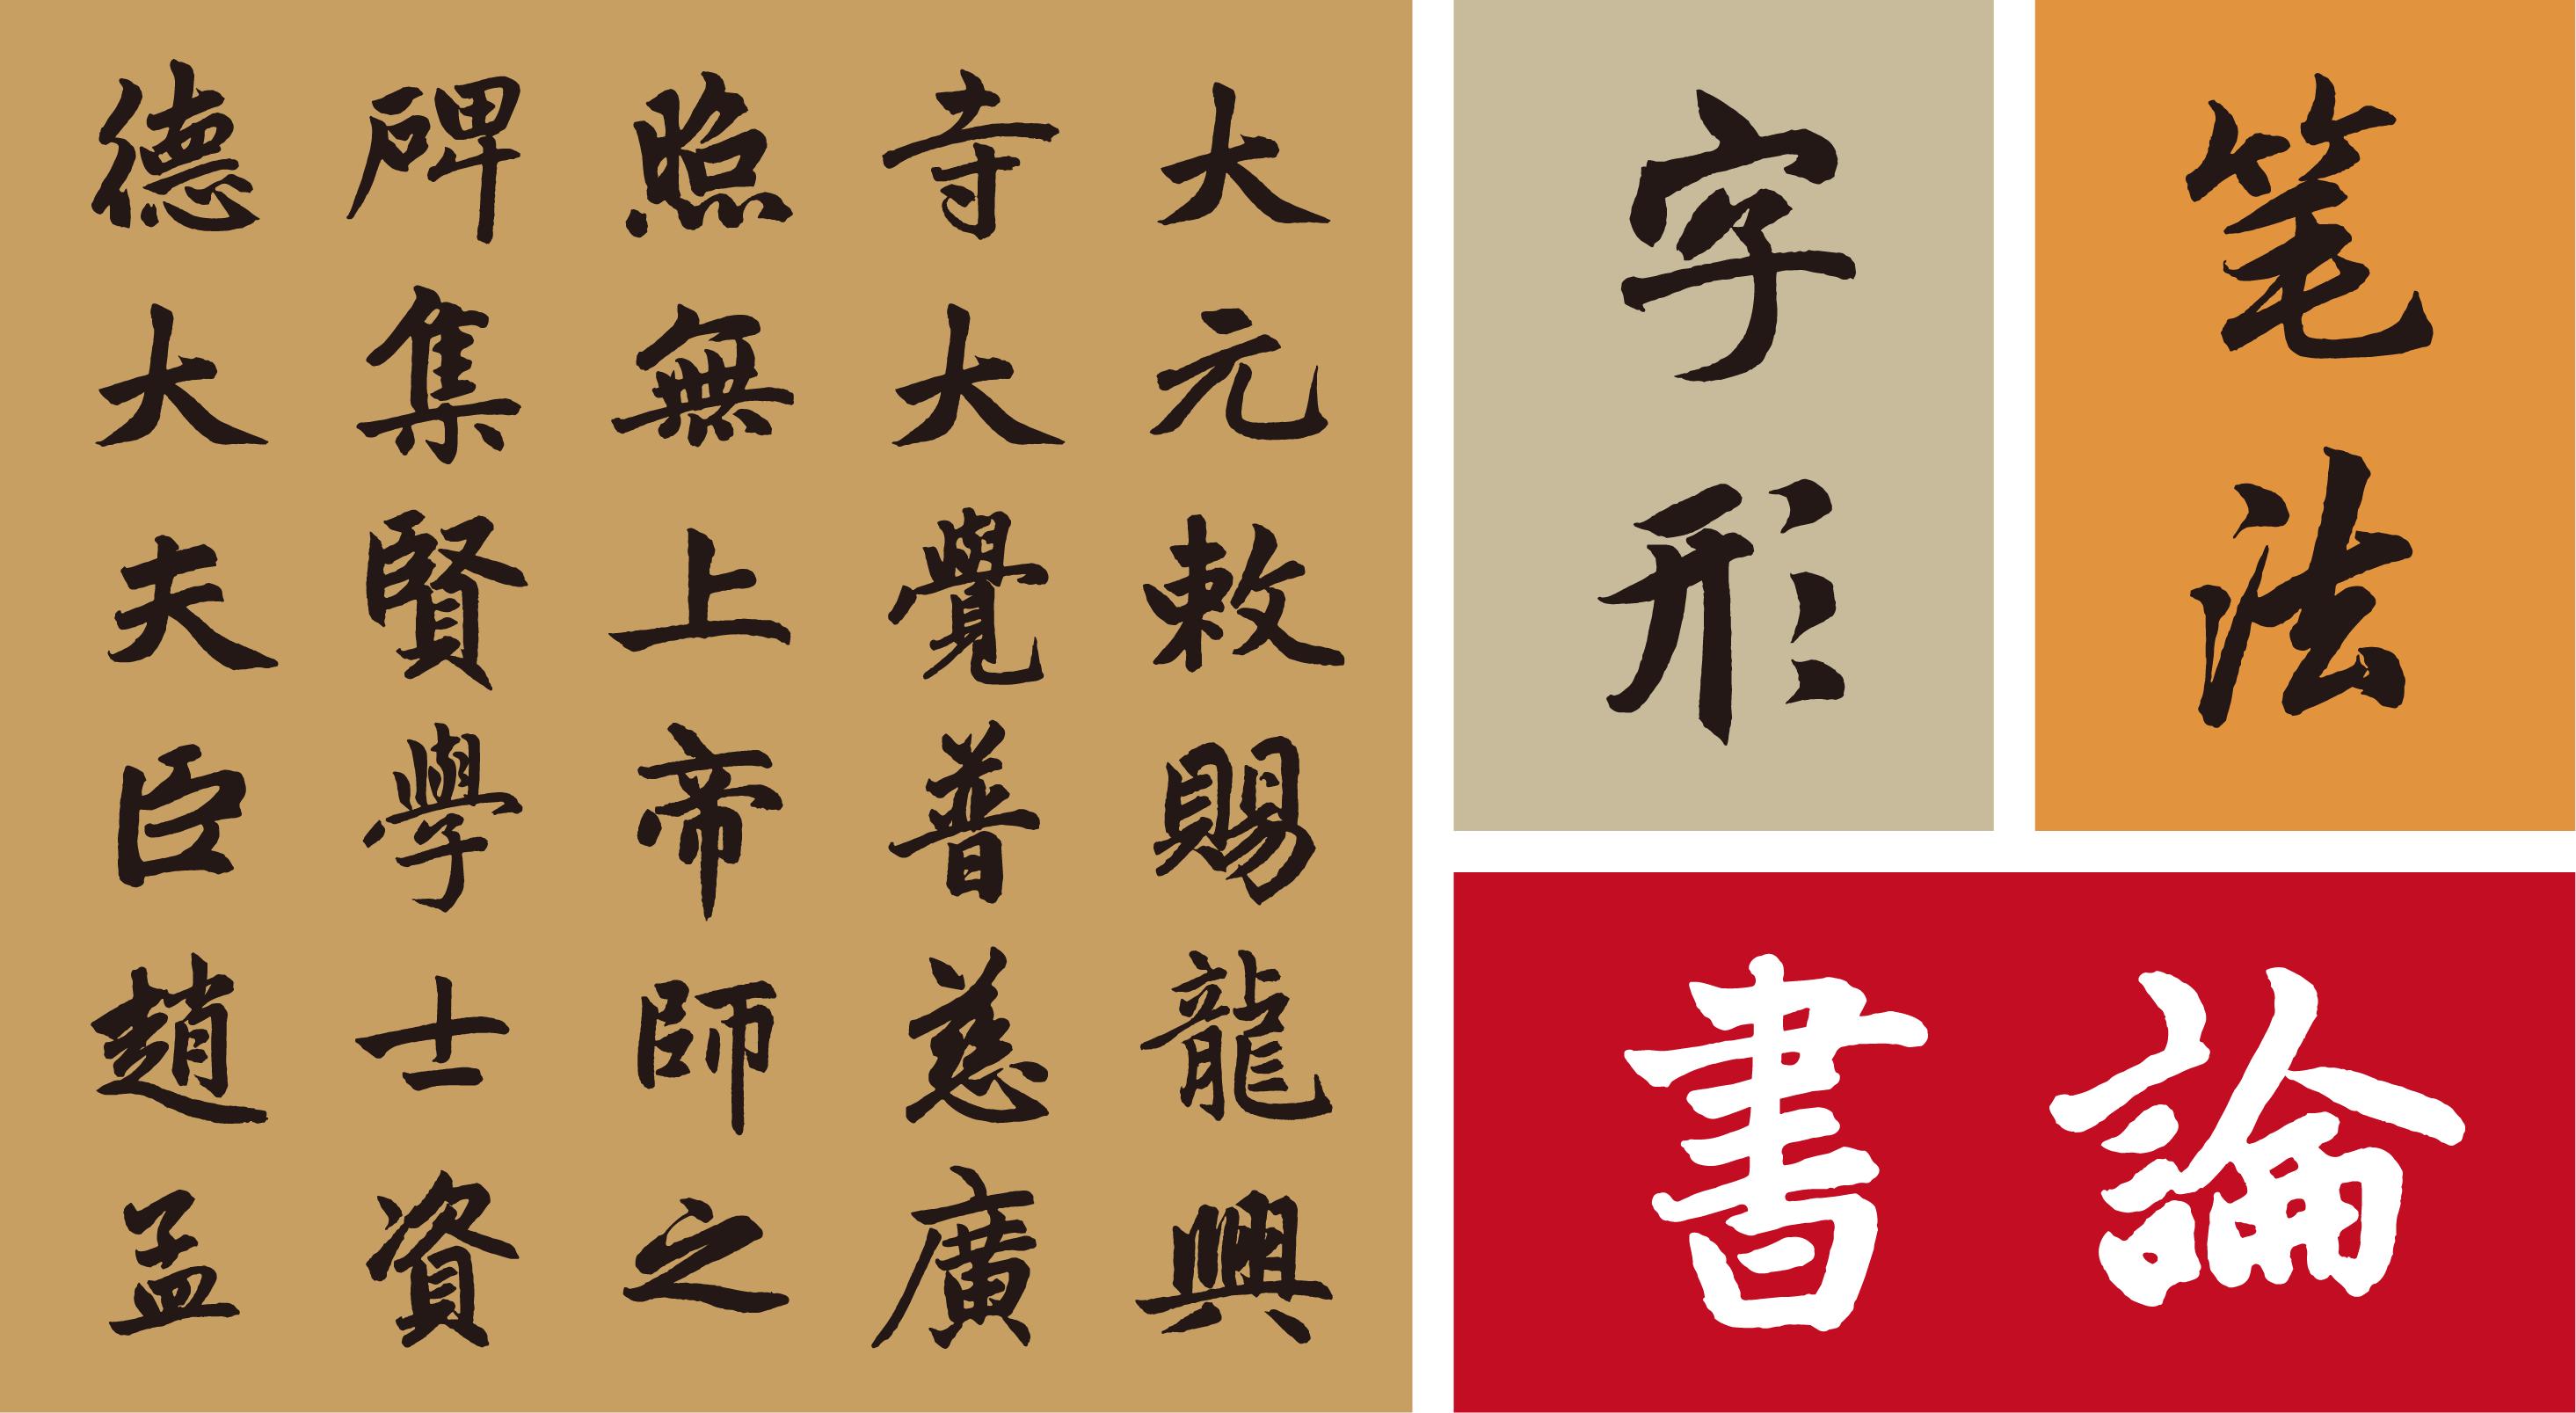 https://ft-bk1.oss-cn-zhangjiakou.aliyuncs.com/Public/Uploads/img/n_content_20201210174811_1052.png